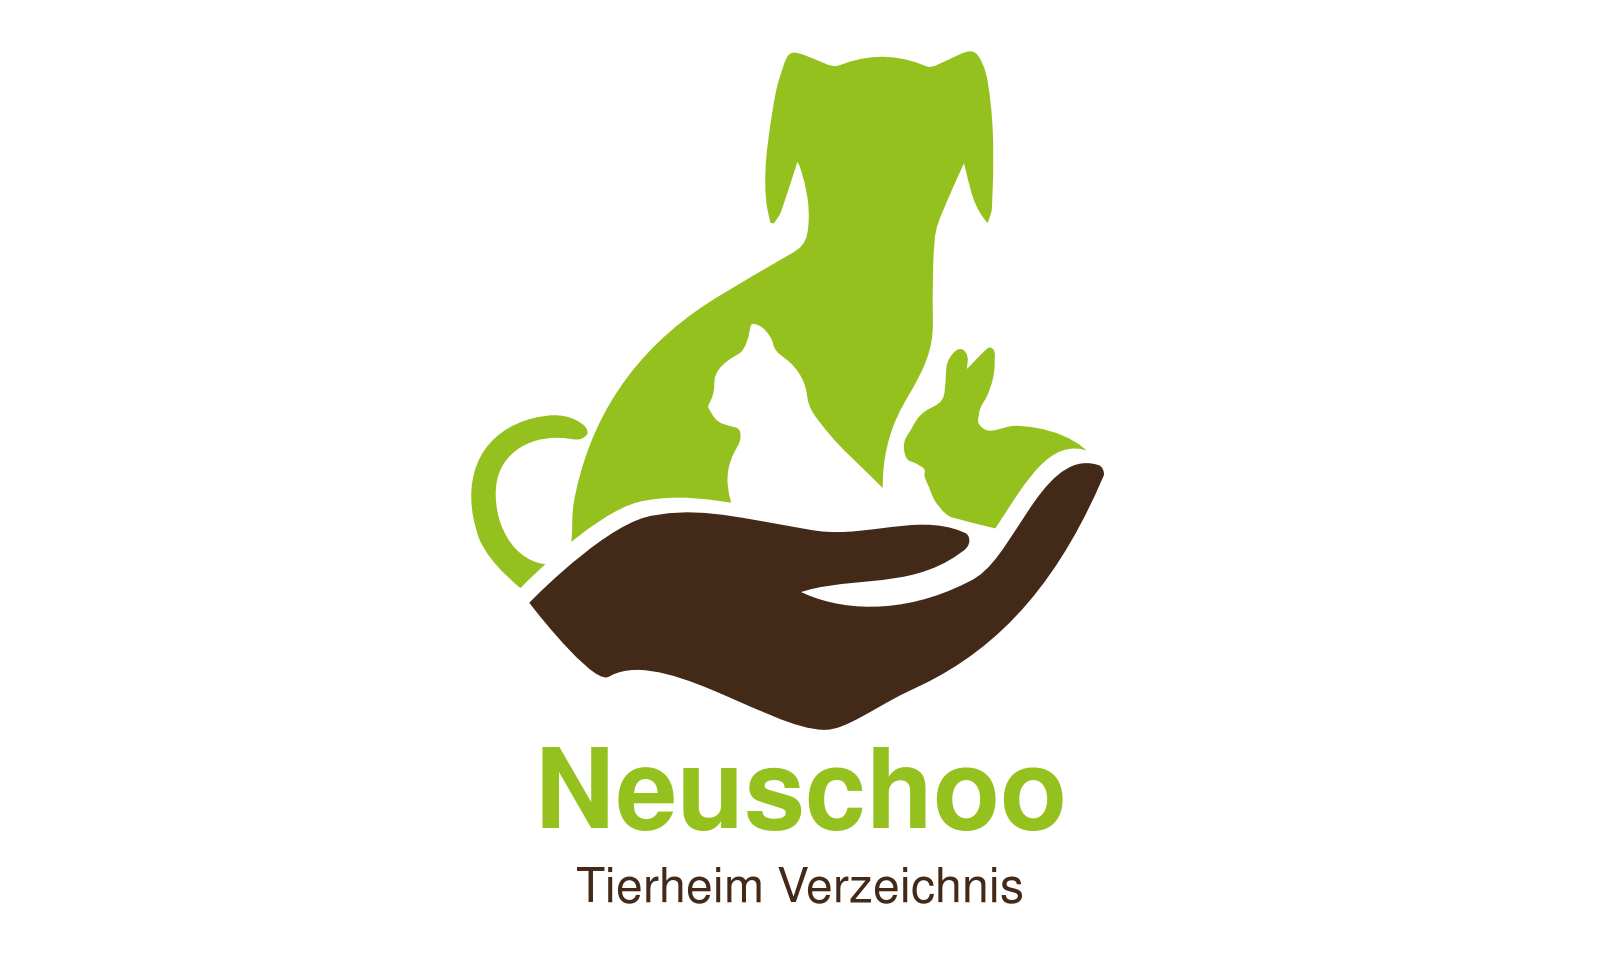 Tierheim Neuschoo